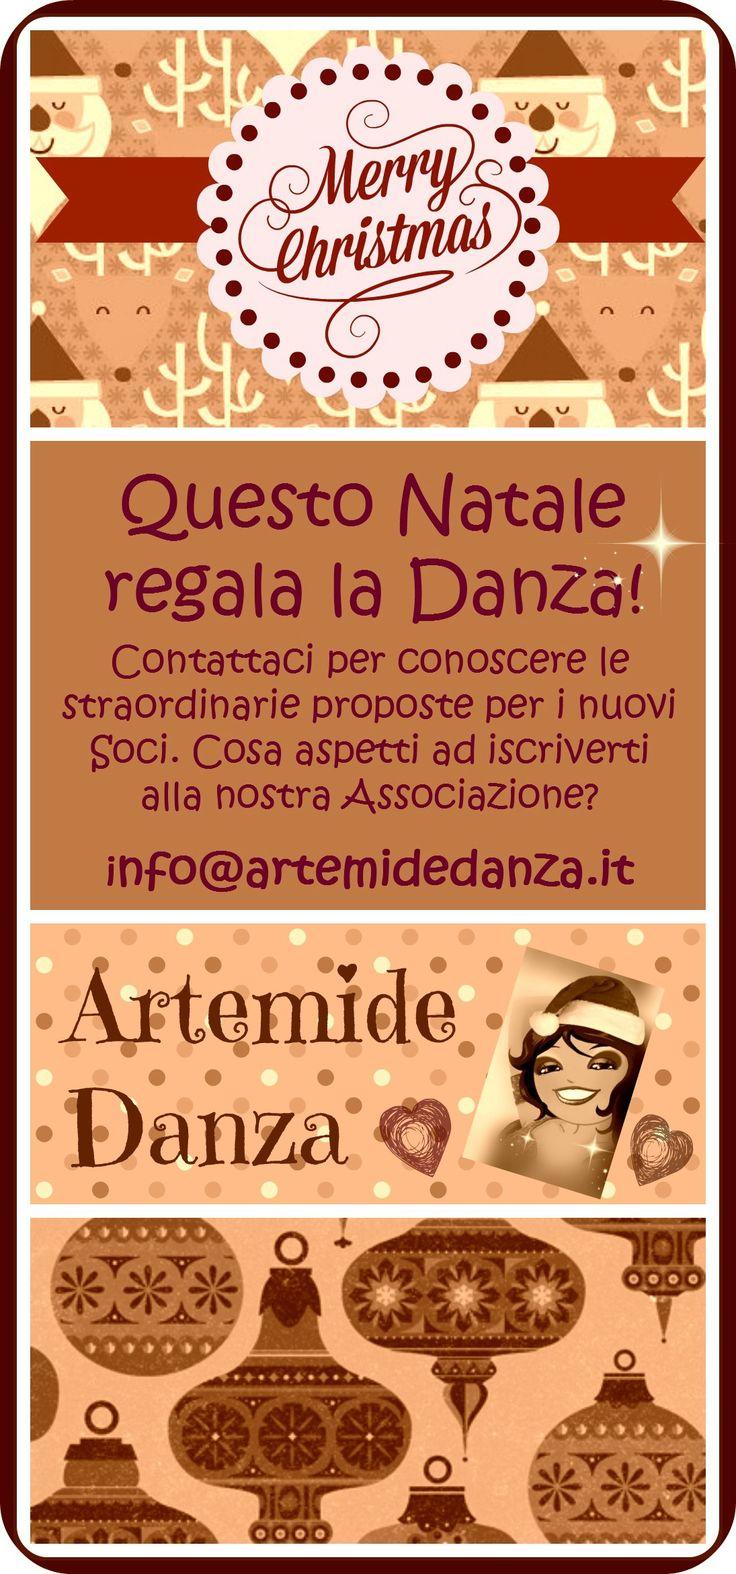 #ArtemideDanza #corsi #Torino #Natale #danzaorientale #bellydance #danzadelventre  Questo Natale regala la Danza Orientale! ❆☃❄  INFO:  https://www.facebook.com/events/1521122614845250/ https://www.smore.com/2zwbw ✉ info@artemidedanza.it